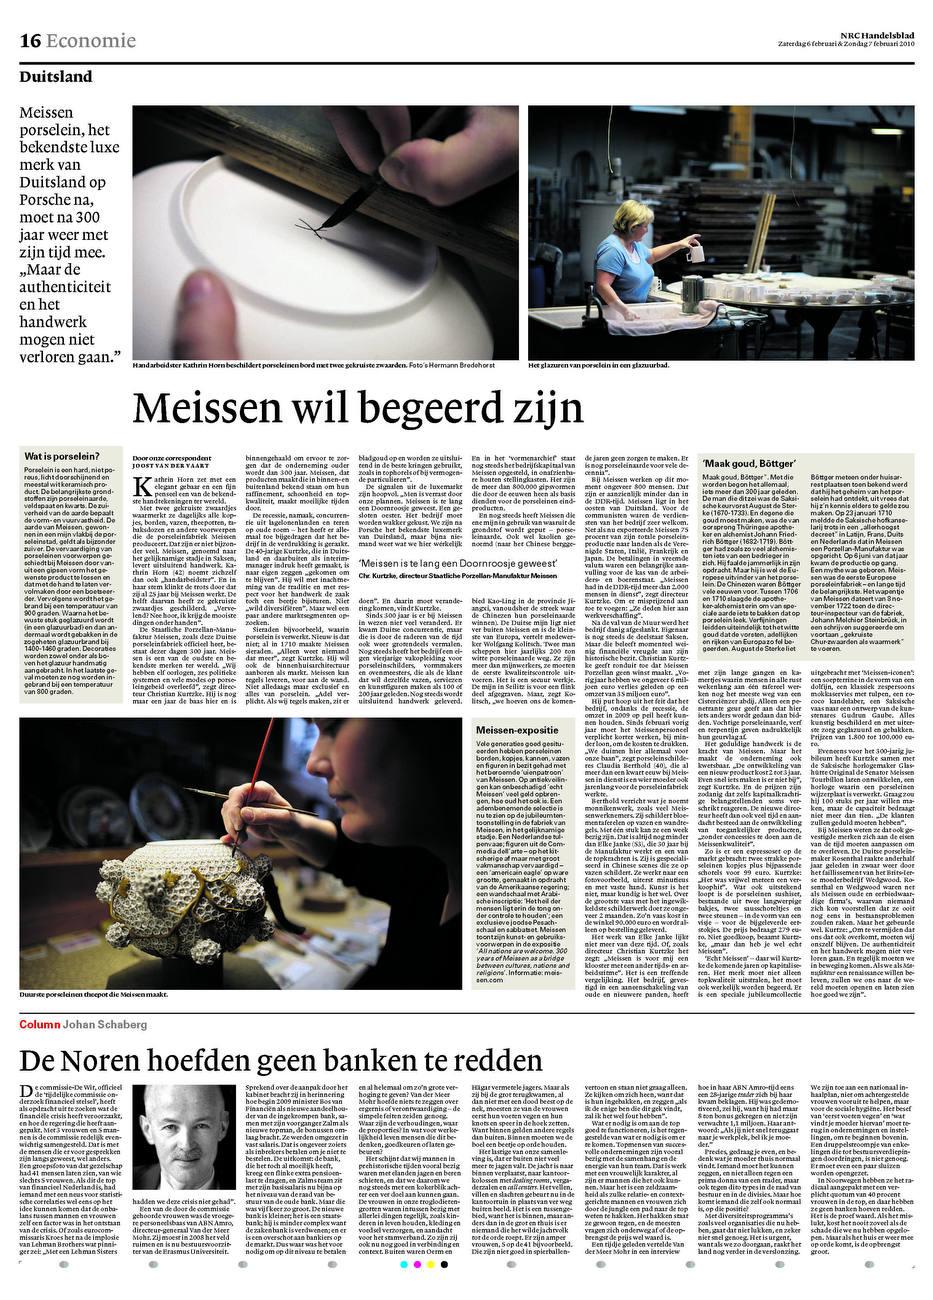 NRC_Handelsblad_meissen